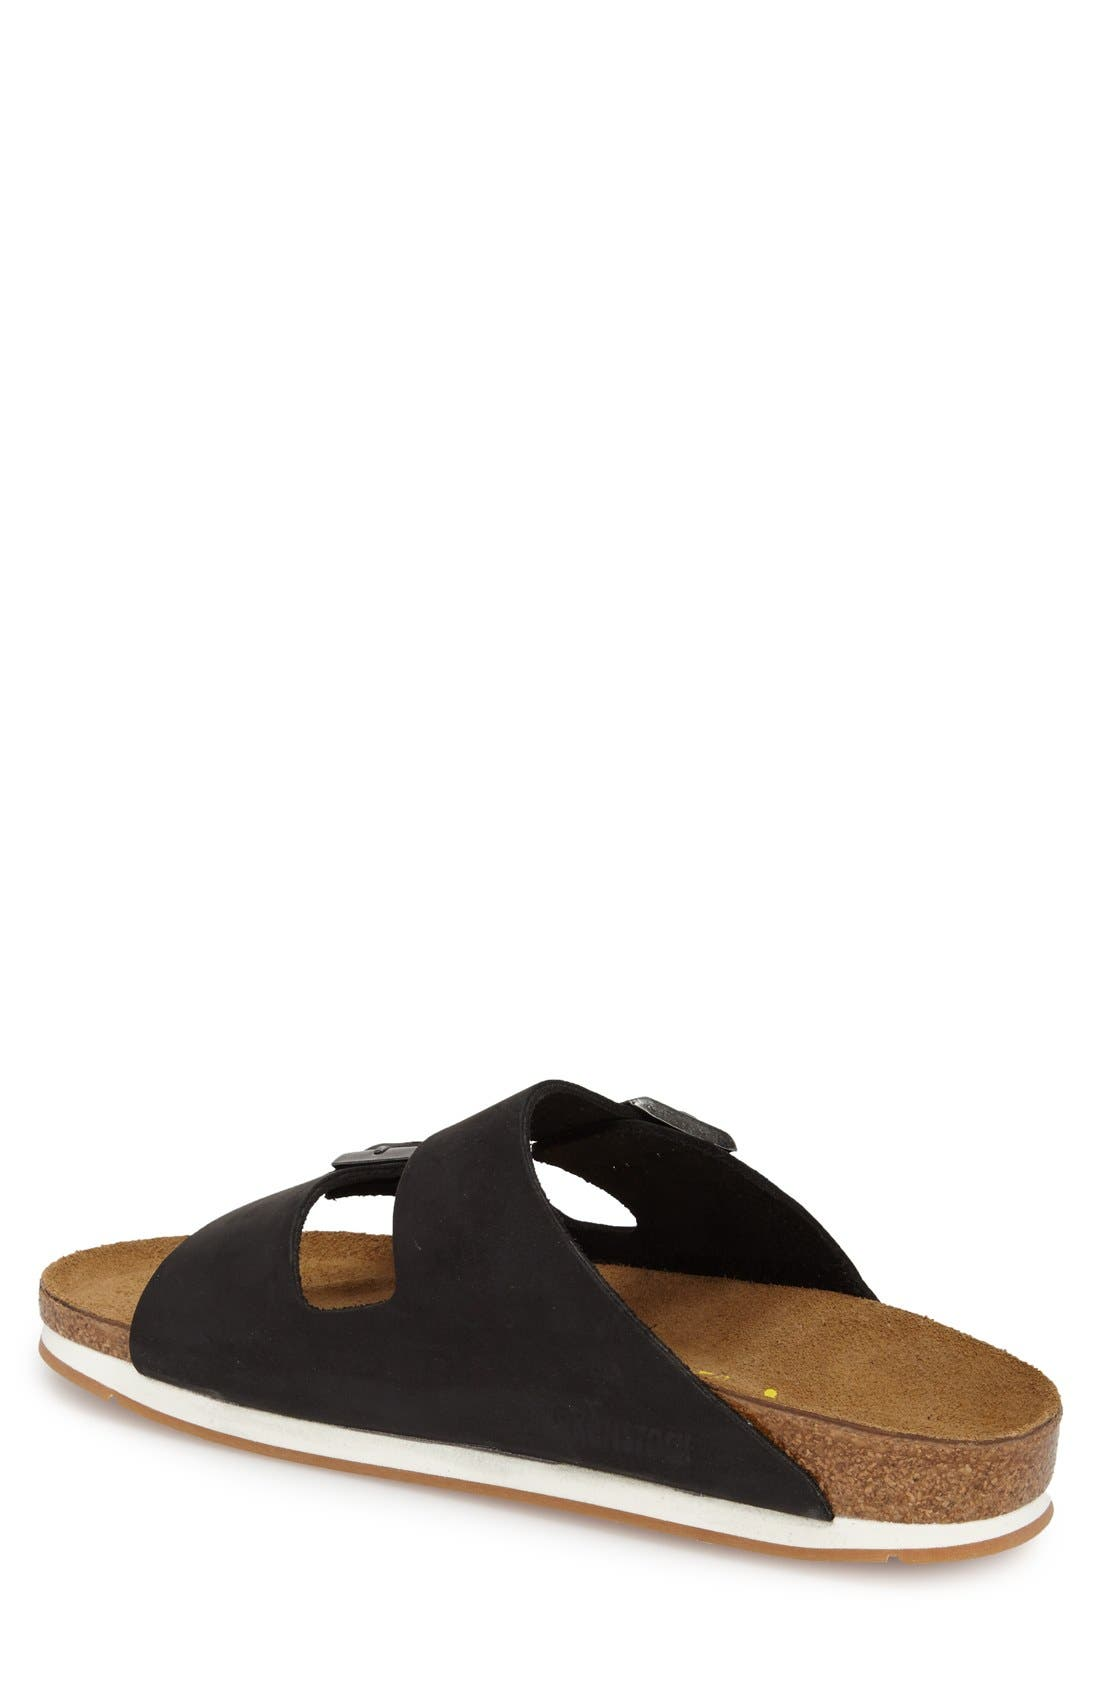 BIRKENSTOCK, 'Arizona' Leather Slide Sandal, Alternate thumbnail 4, color, 001